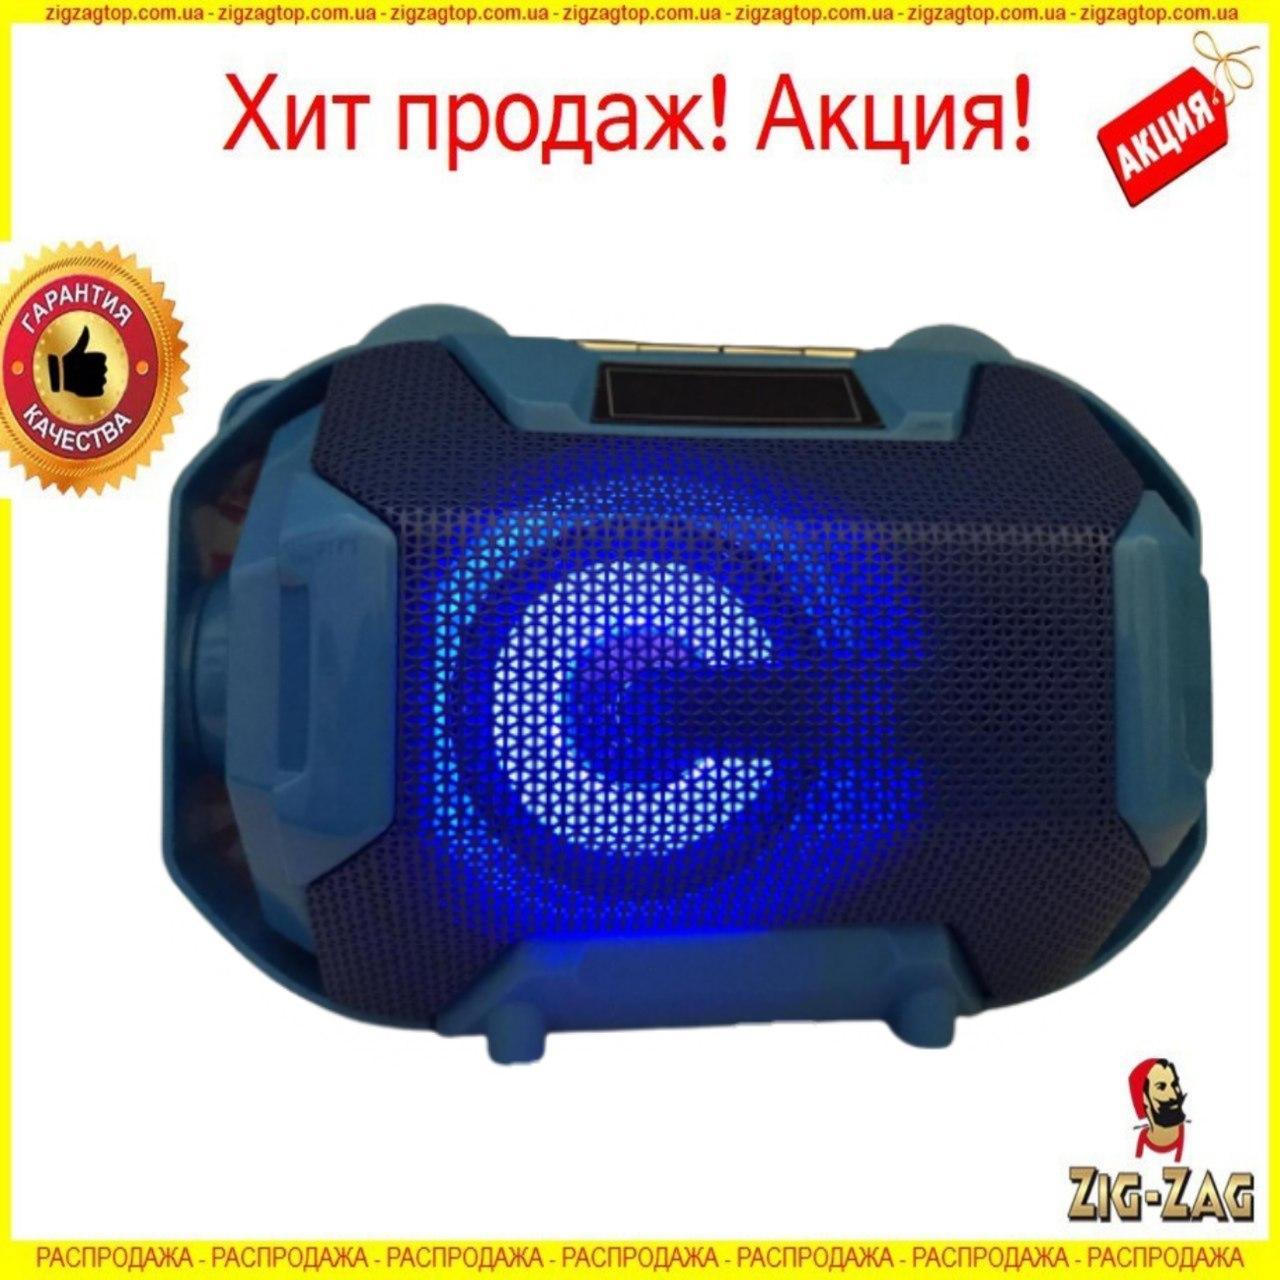 Портативная колонка Bluetooth GOLON RX S300BTD с ФОНАРИКОМ Блютуз Аккумуляторная Голон Акустика Радио FM ФМ